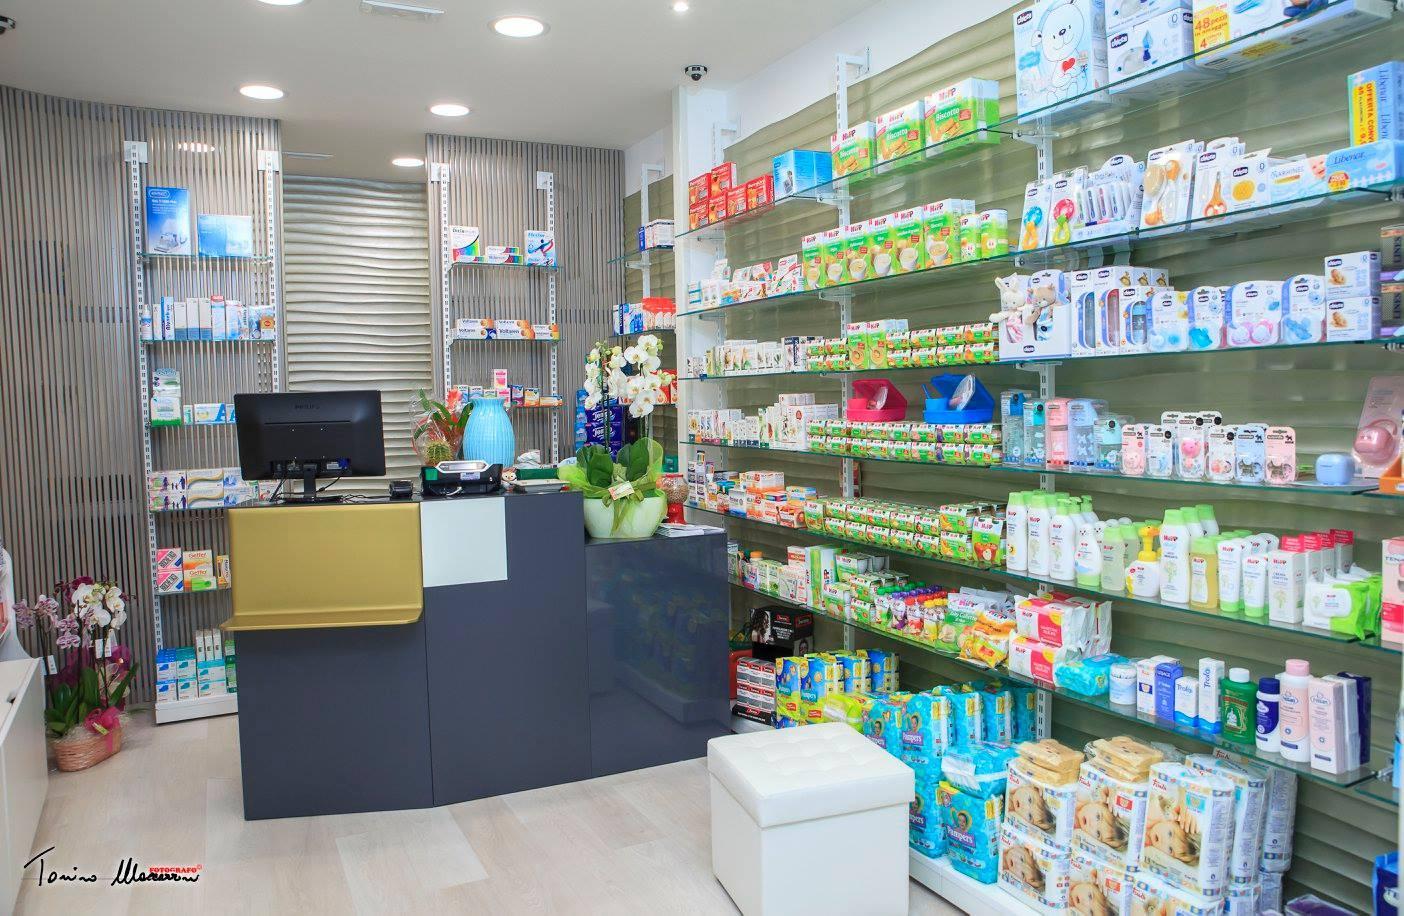 Parafarmacia acitrezza ct arredamento per farmacie e for Arredamento parafarmacia